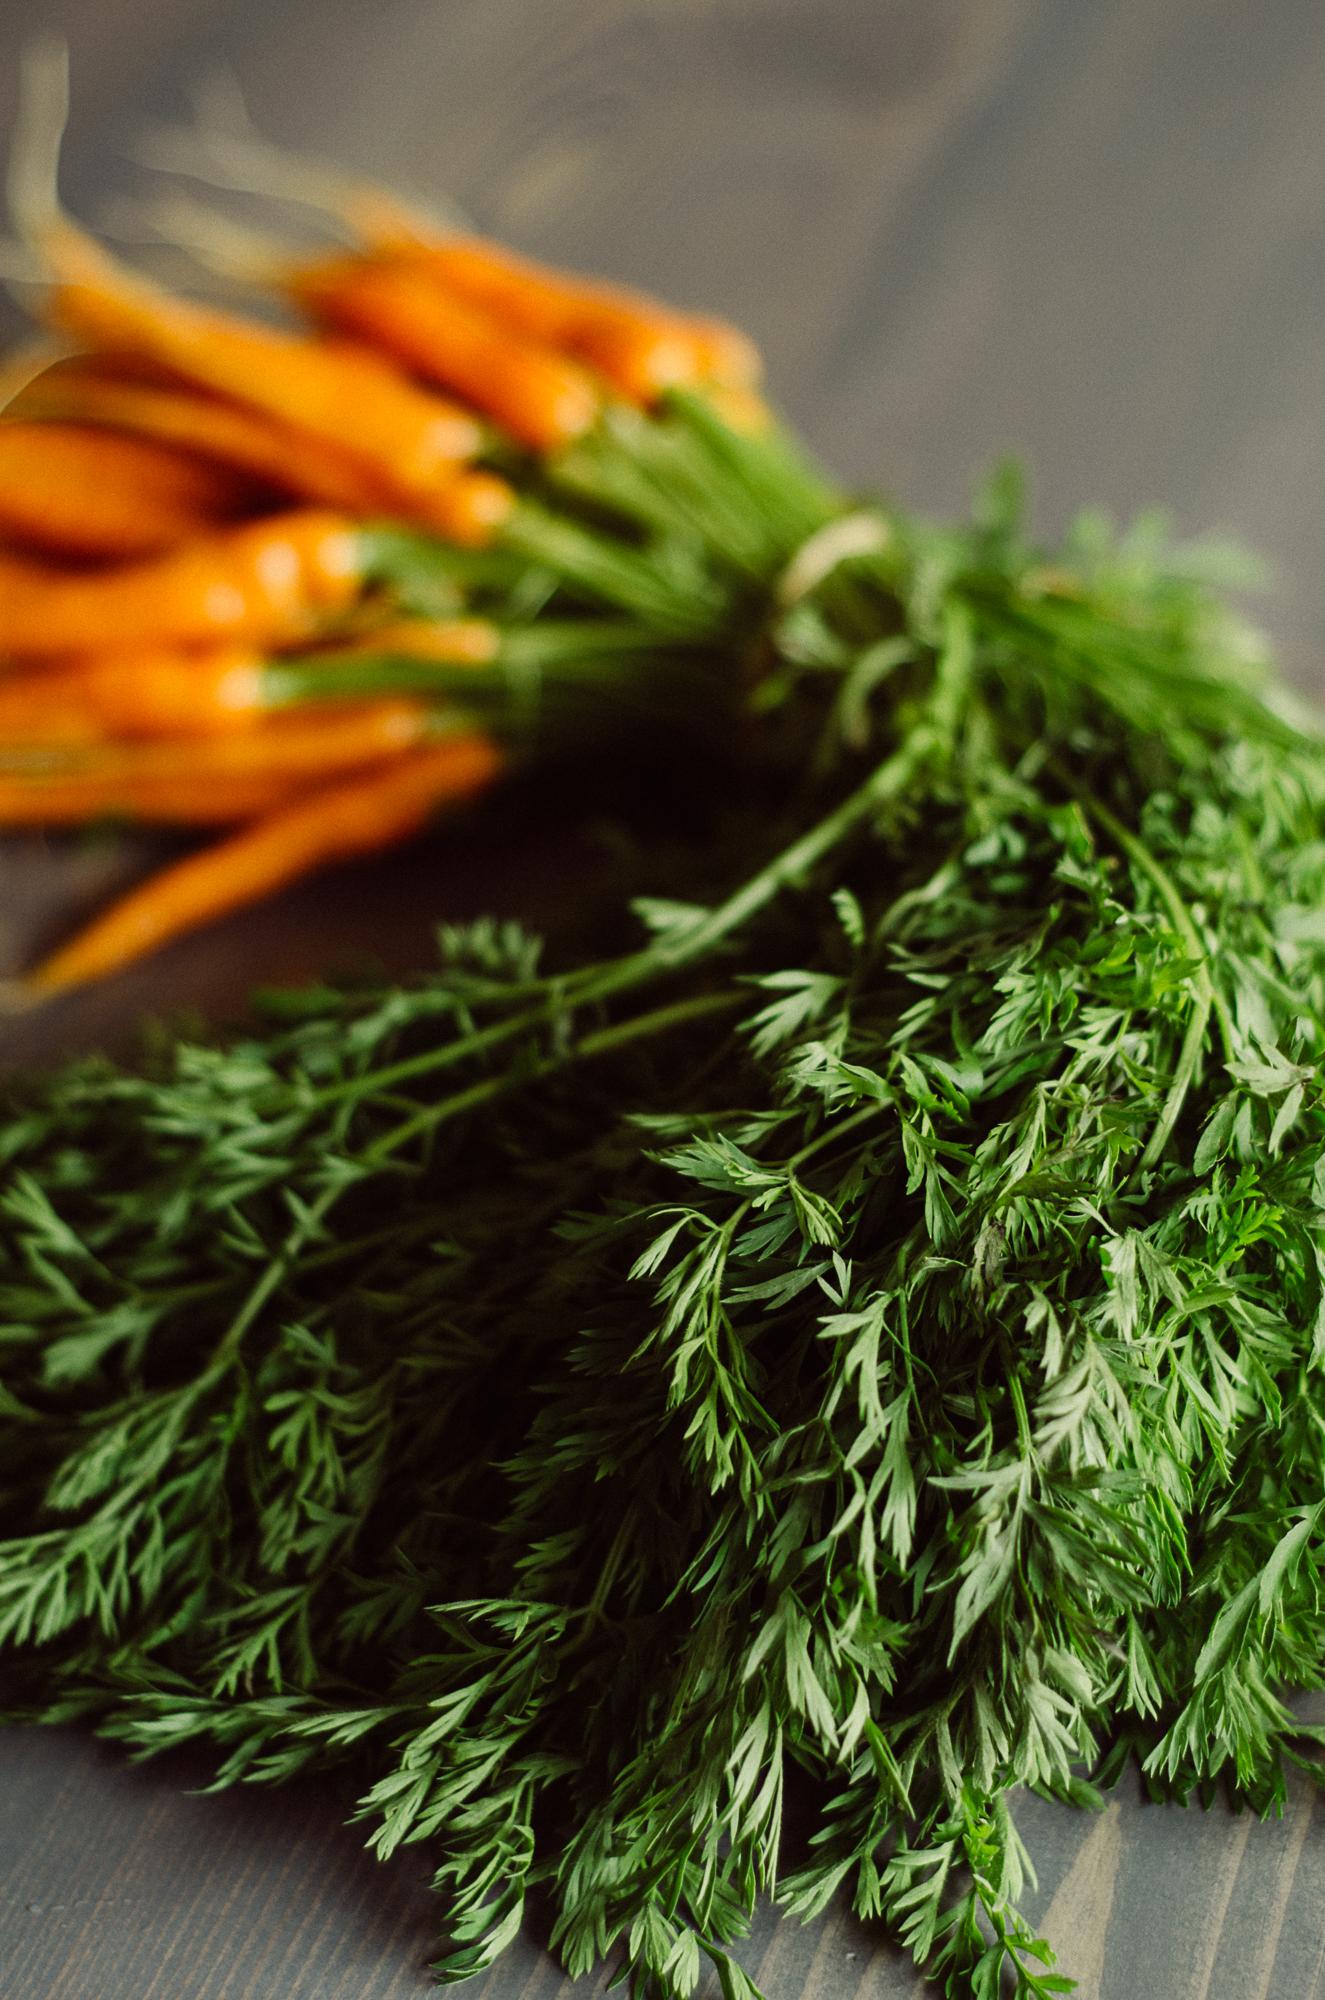 Are carrot tops edible? Carrot top recipes.